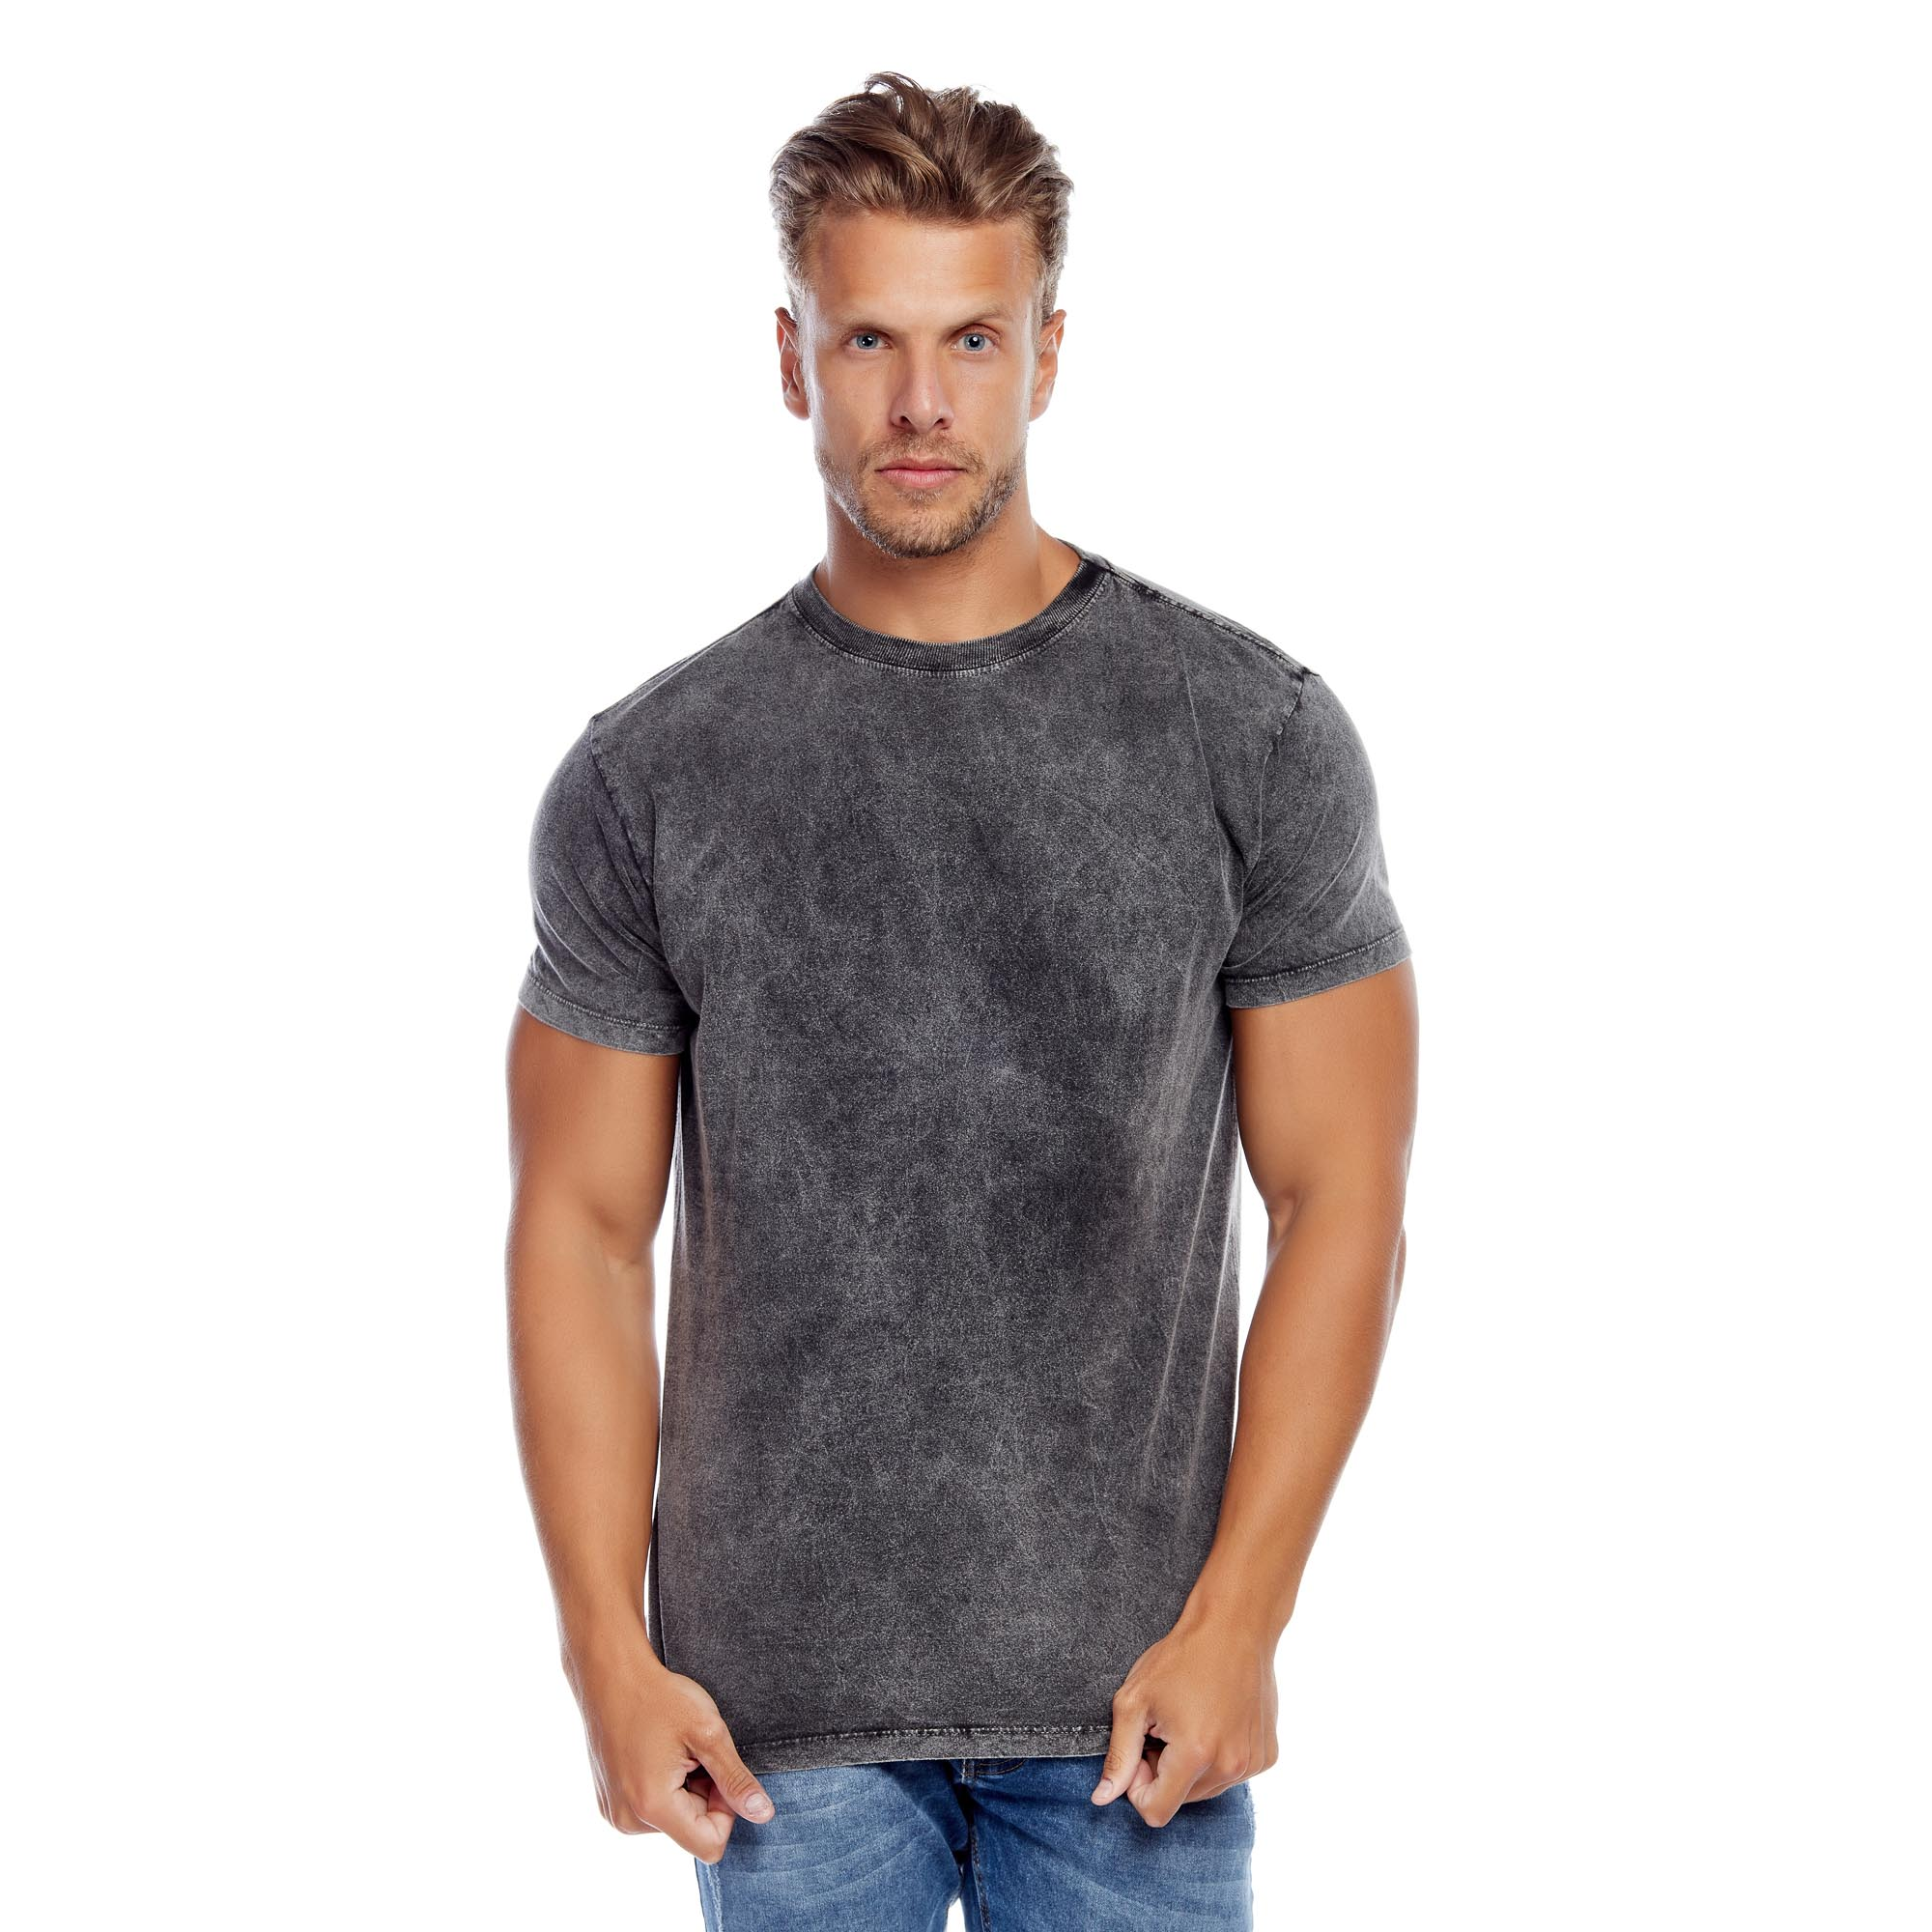 Camiseta Masculina Marmorizada Tradicional Evolvee